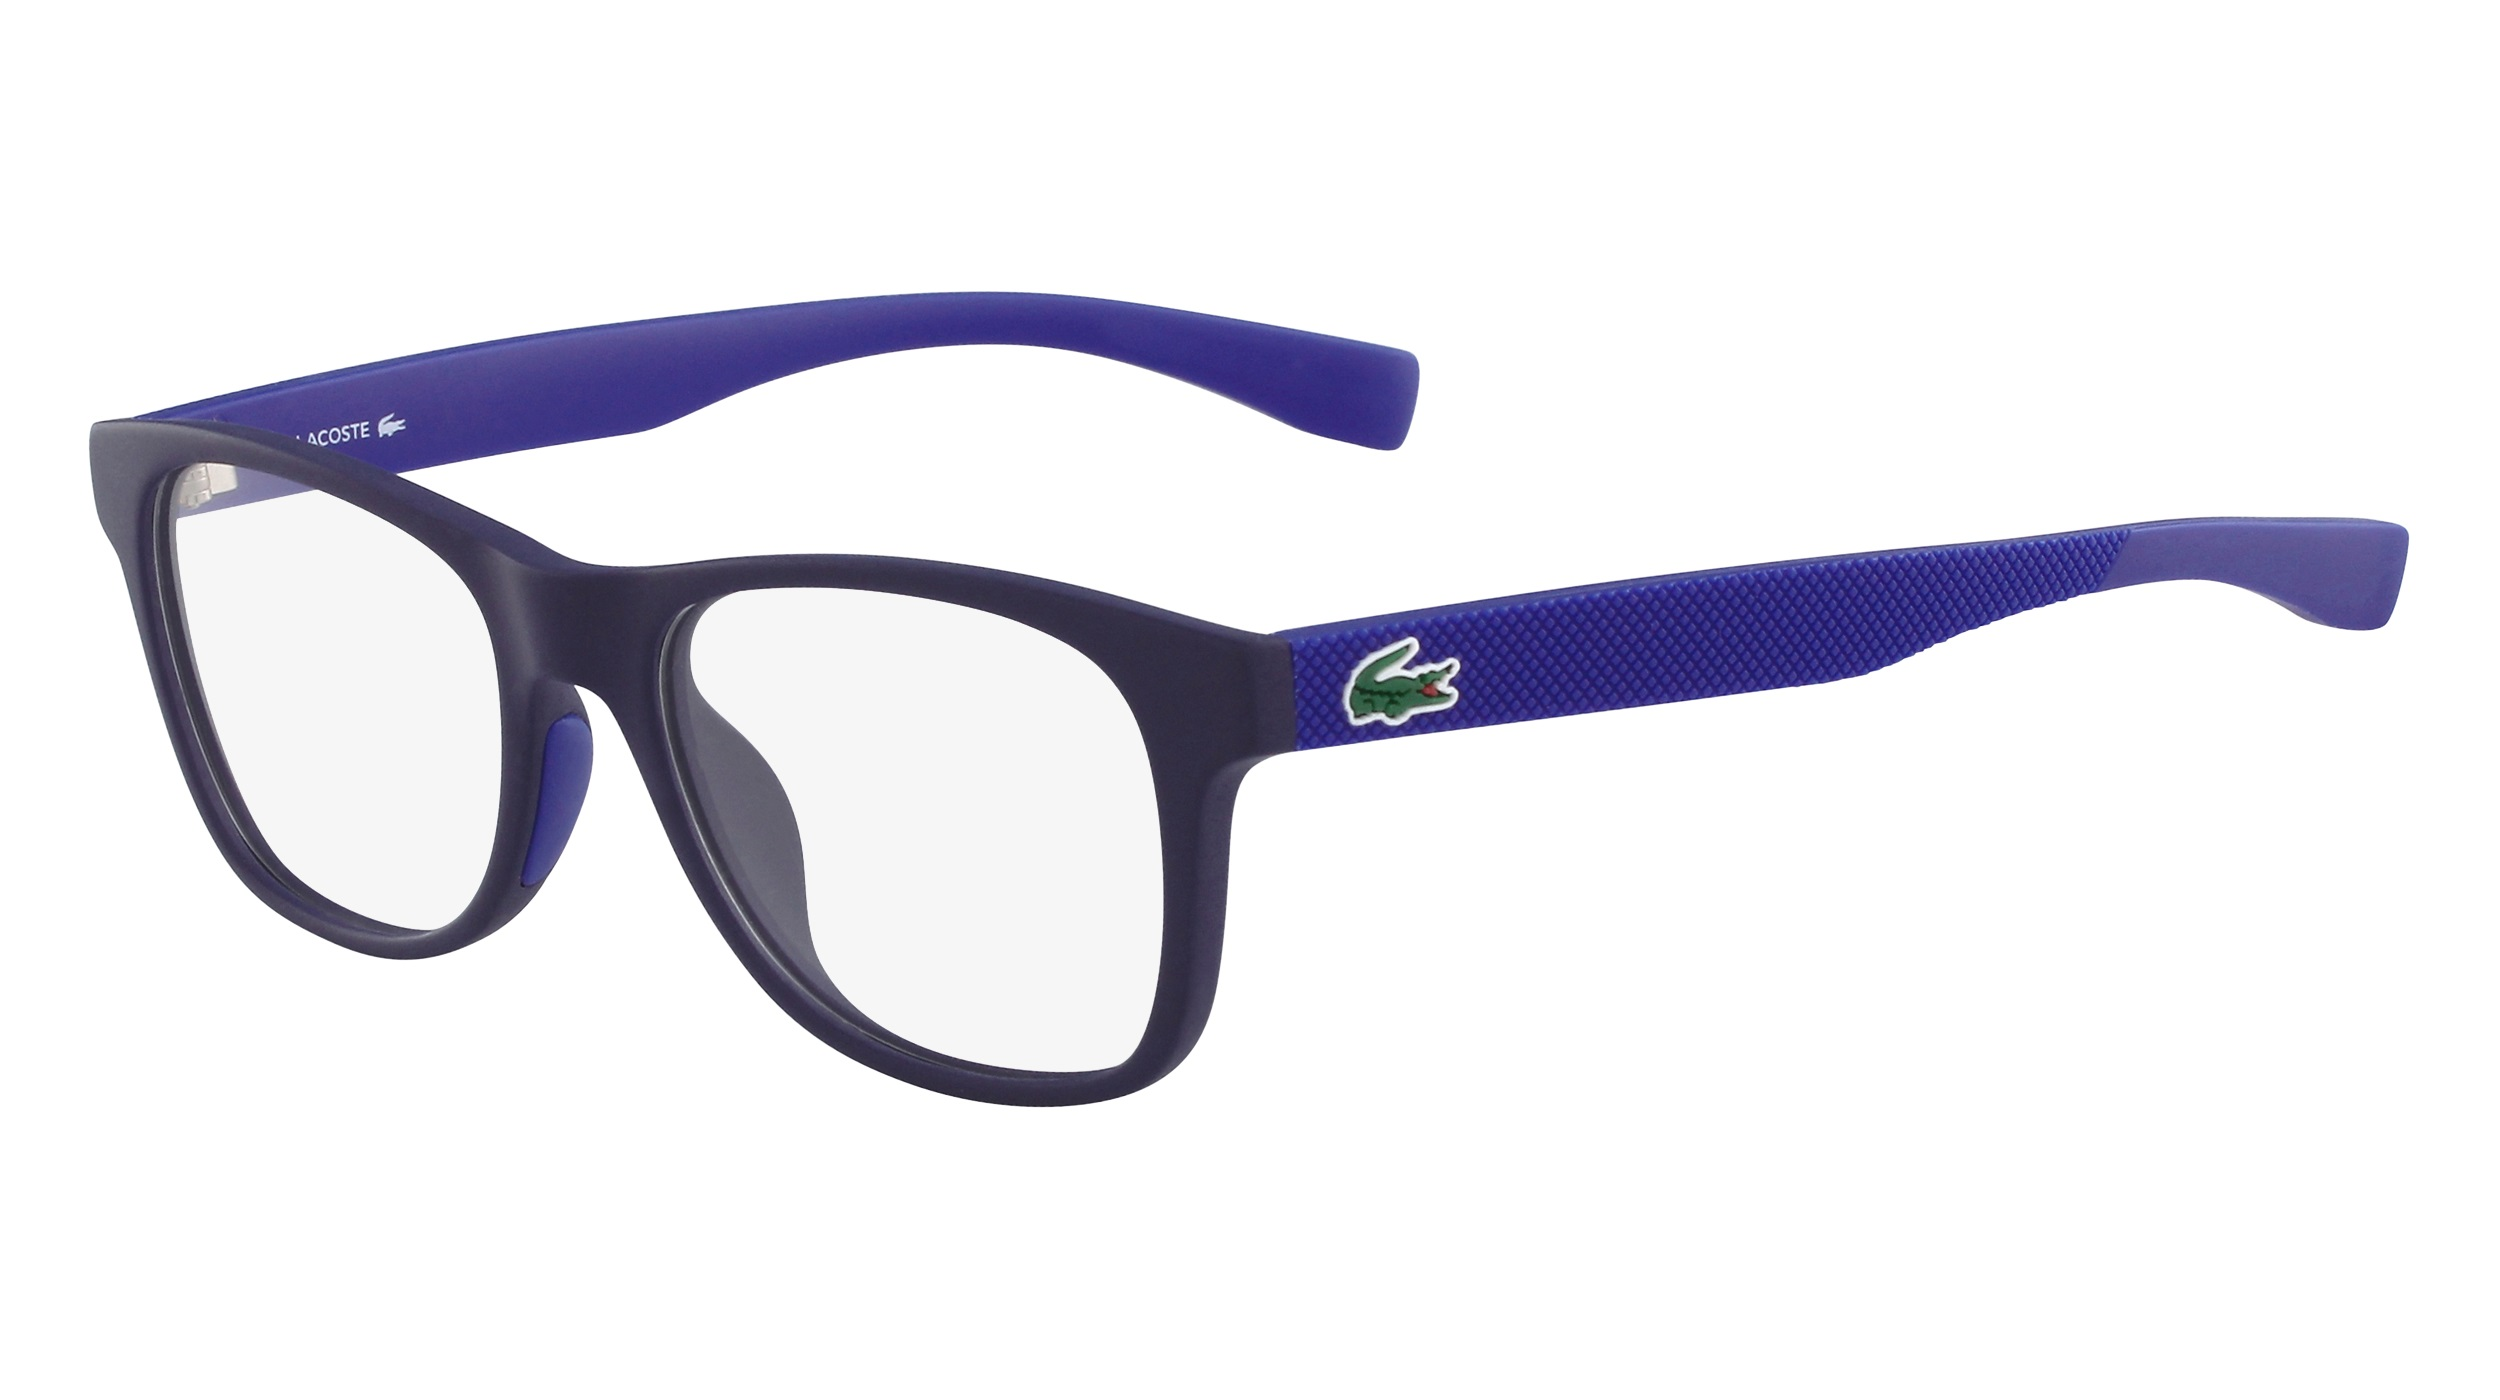 97a09409767 Lacoste L3620-424 Kids Eyeglasses Matte Blue L3620-424 - Optiwow